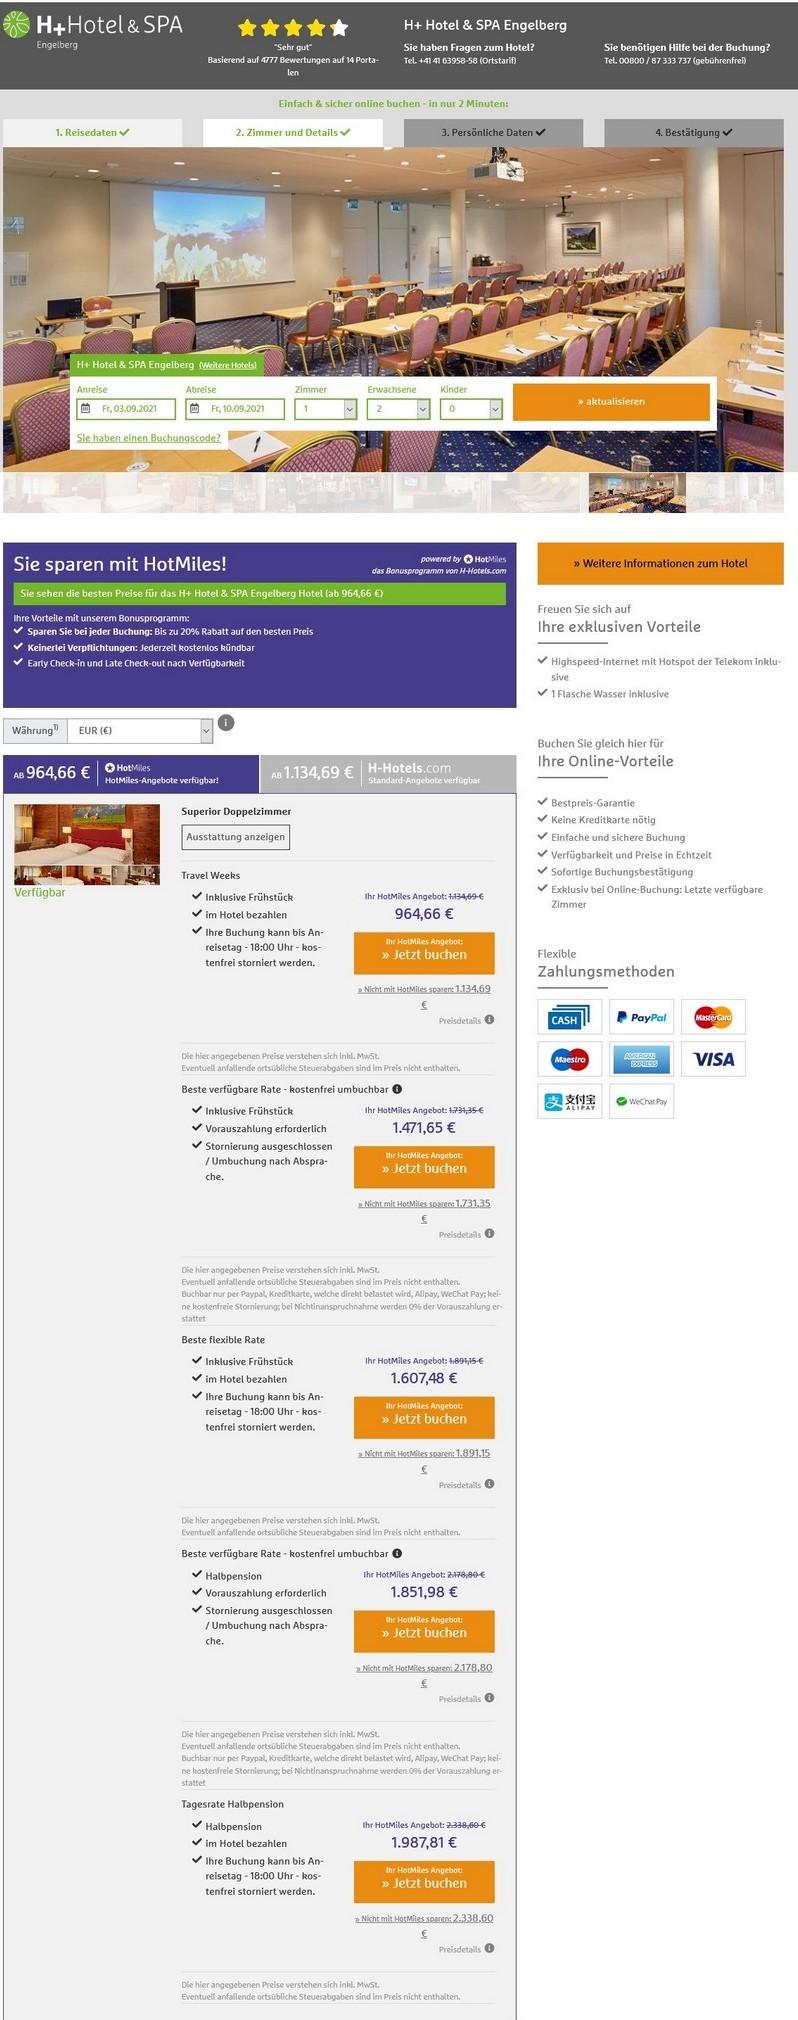 Preisbeispiel H-Hotels Travel Weeks im H+ Hotel & Spa Engelberg